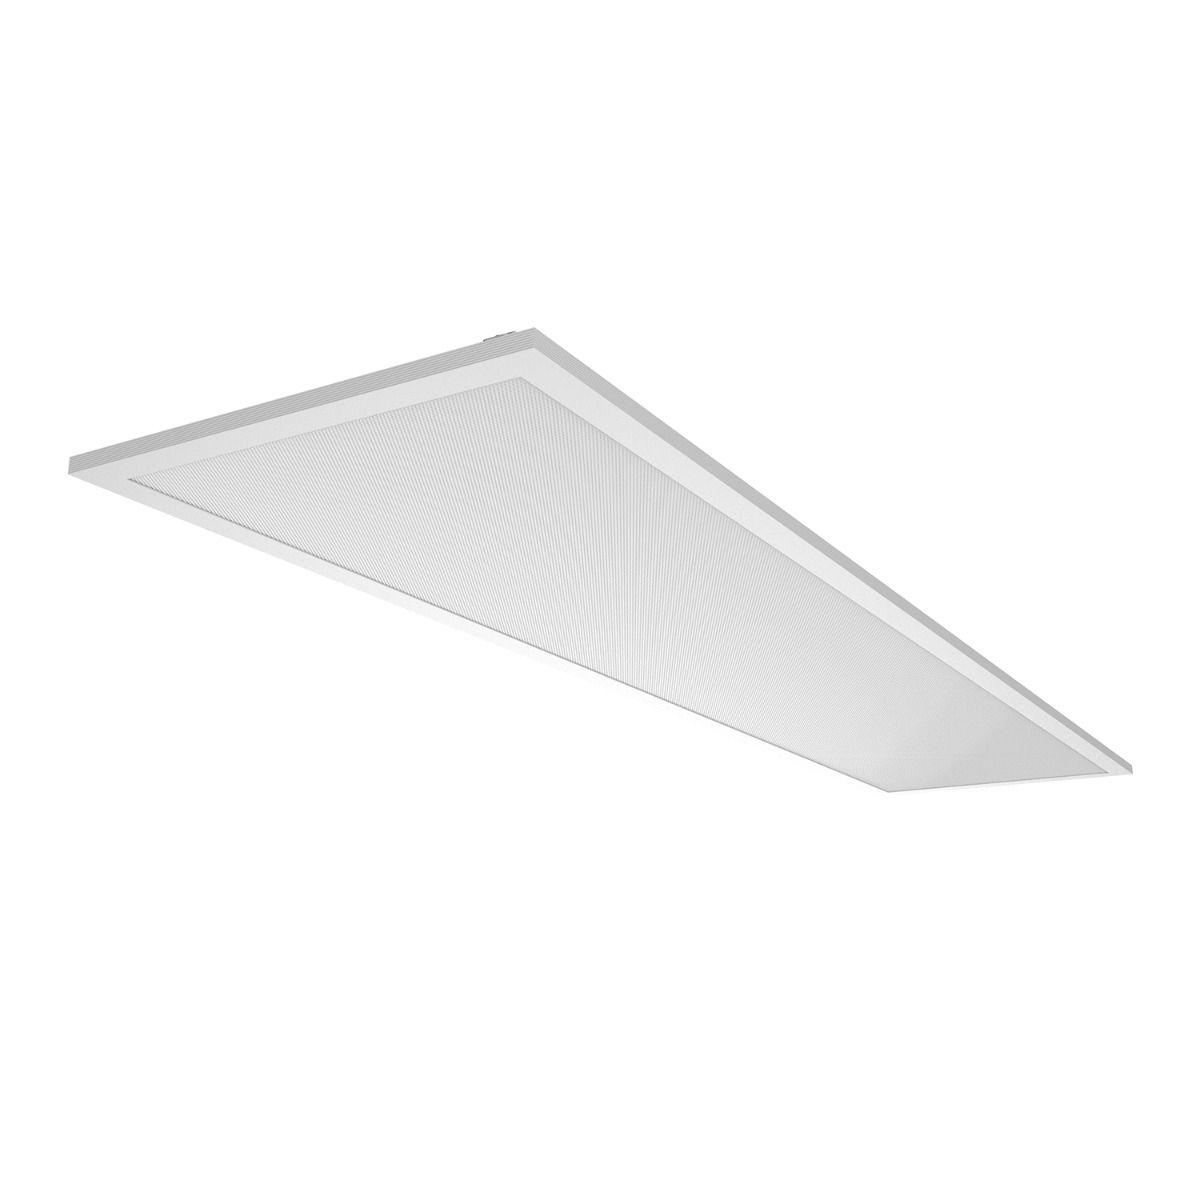 Noxion LED Panel Delta Pro V3 Highlum 36W 4000K 5500lm 30x120cm UGR <19 | Kallvit - Ersättare 2x36\W